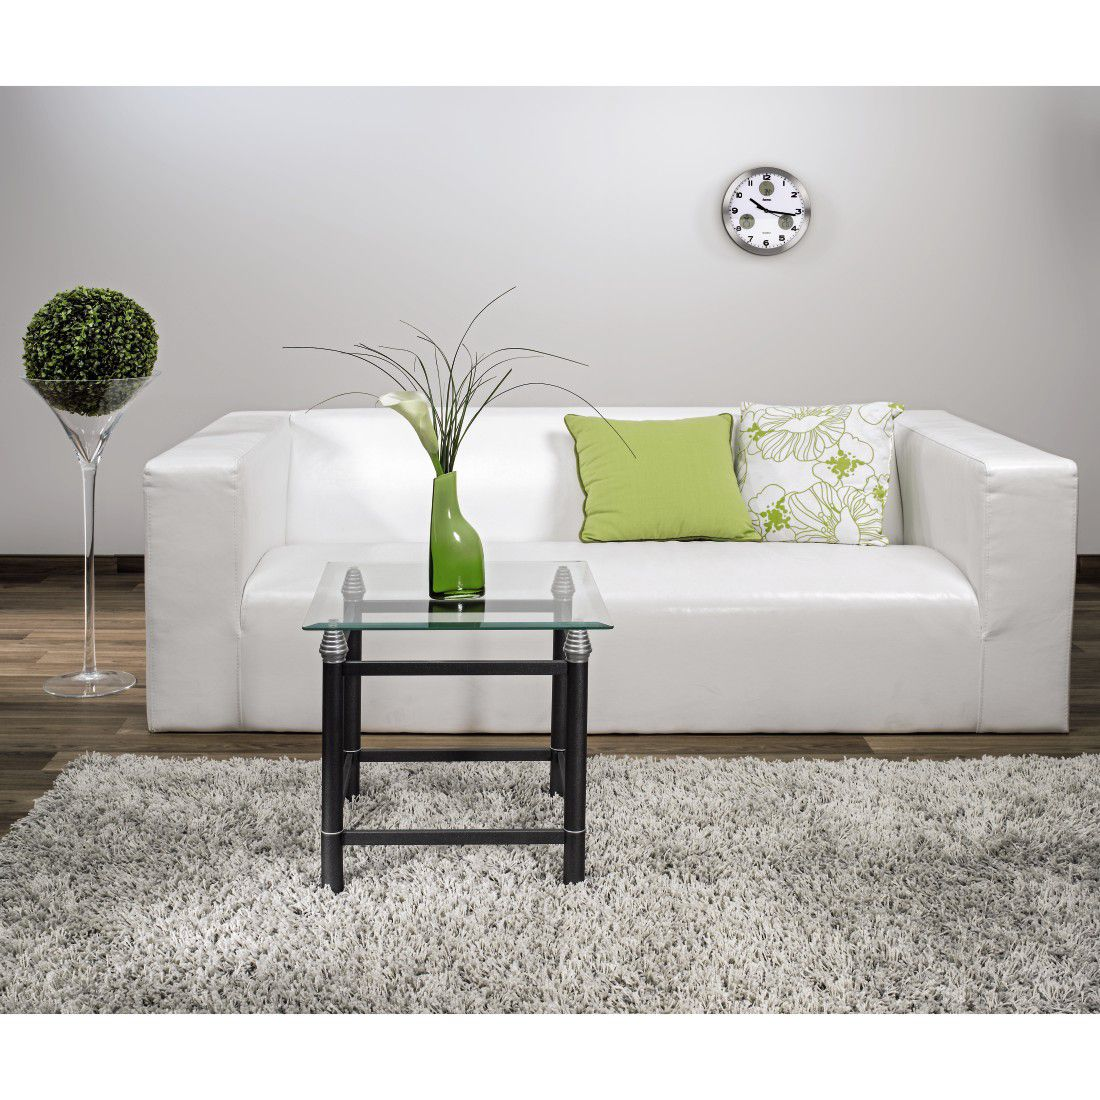 hama wanduhr ag 300 mit wetterstation schwab versand. Black Bedroom Furniture Sets. Home Design Ideas